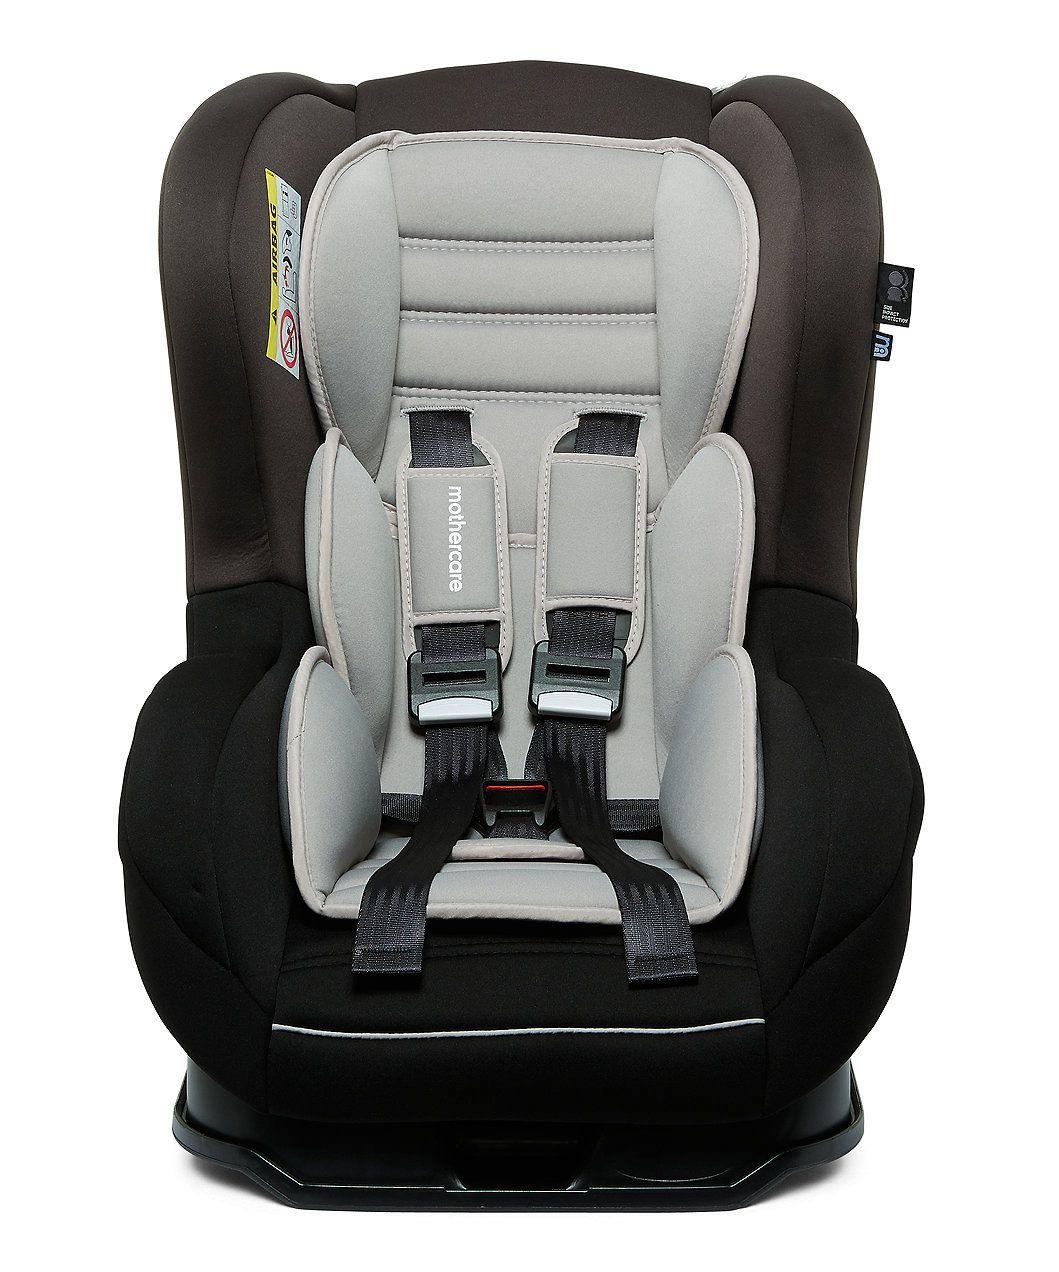 Madrid Combination Car Seat Black Car seats, Baby car